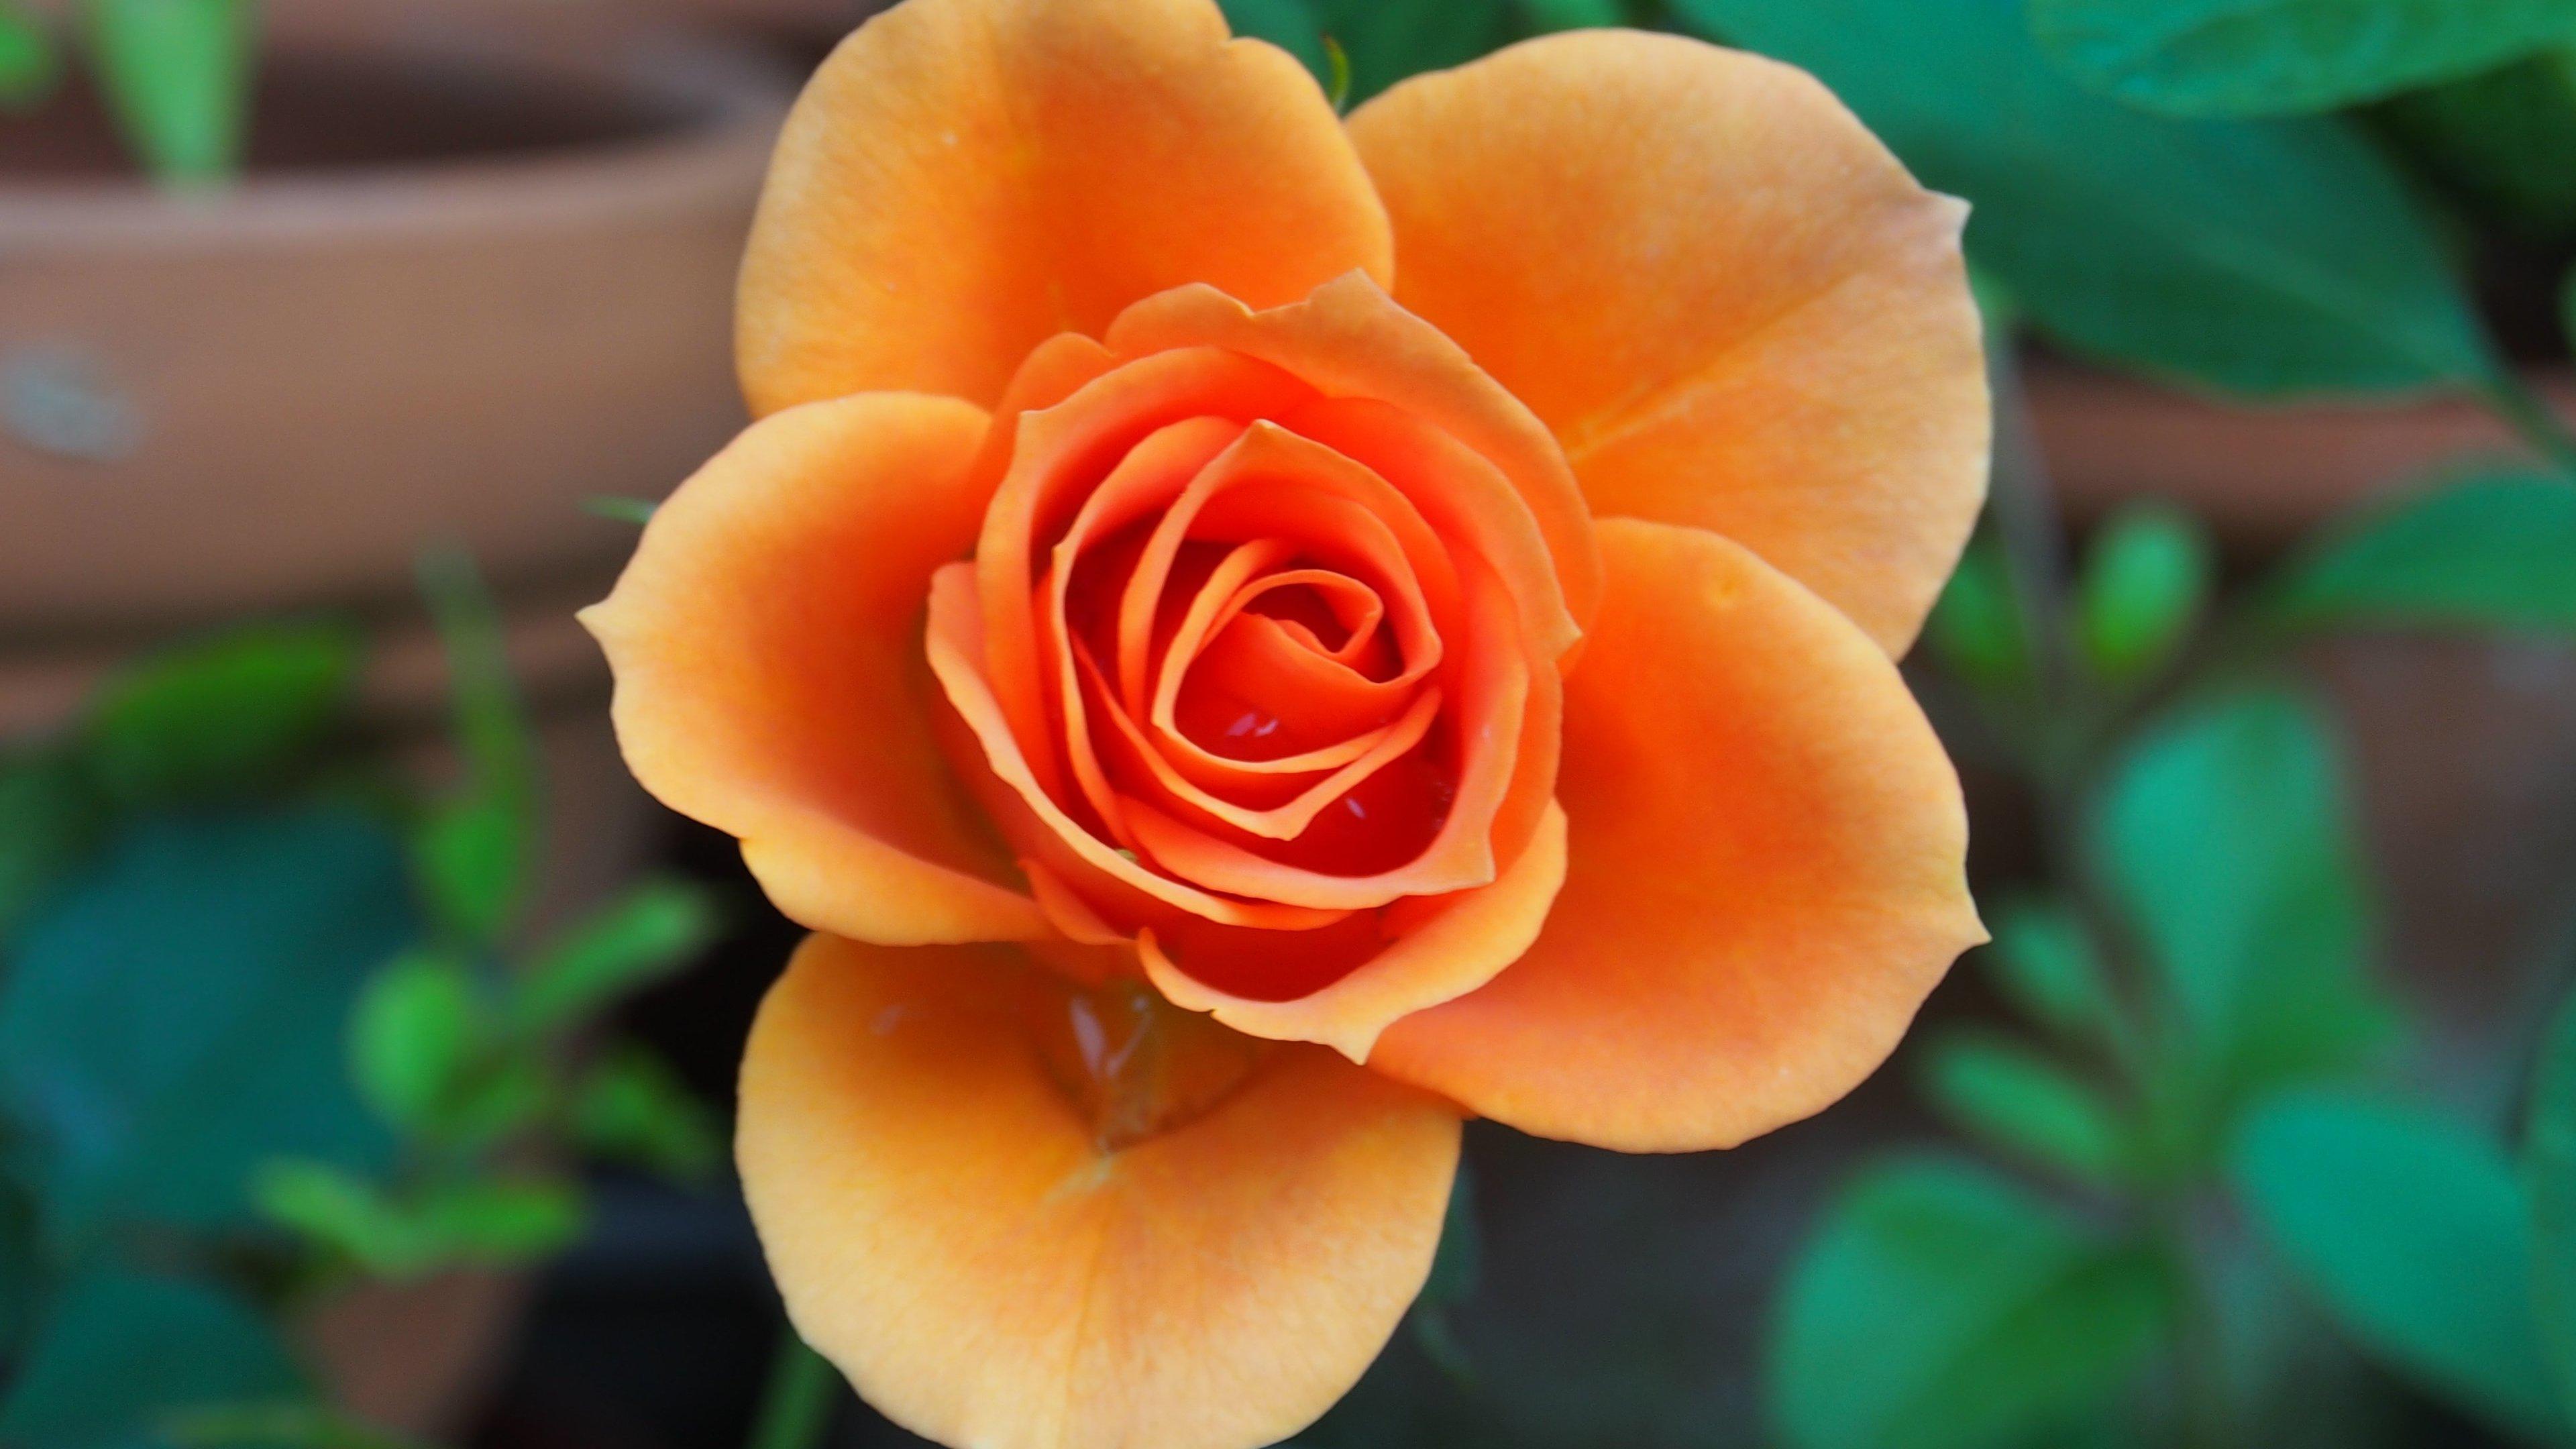 Orange Rose Wallpaper Iphone Android Desktop Backgrounds